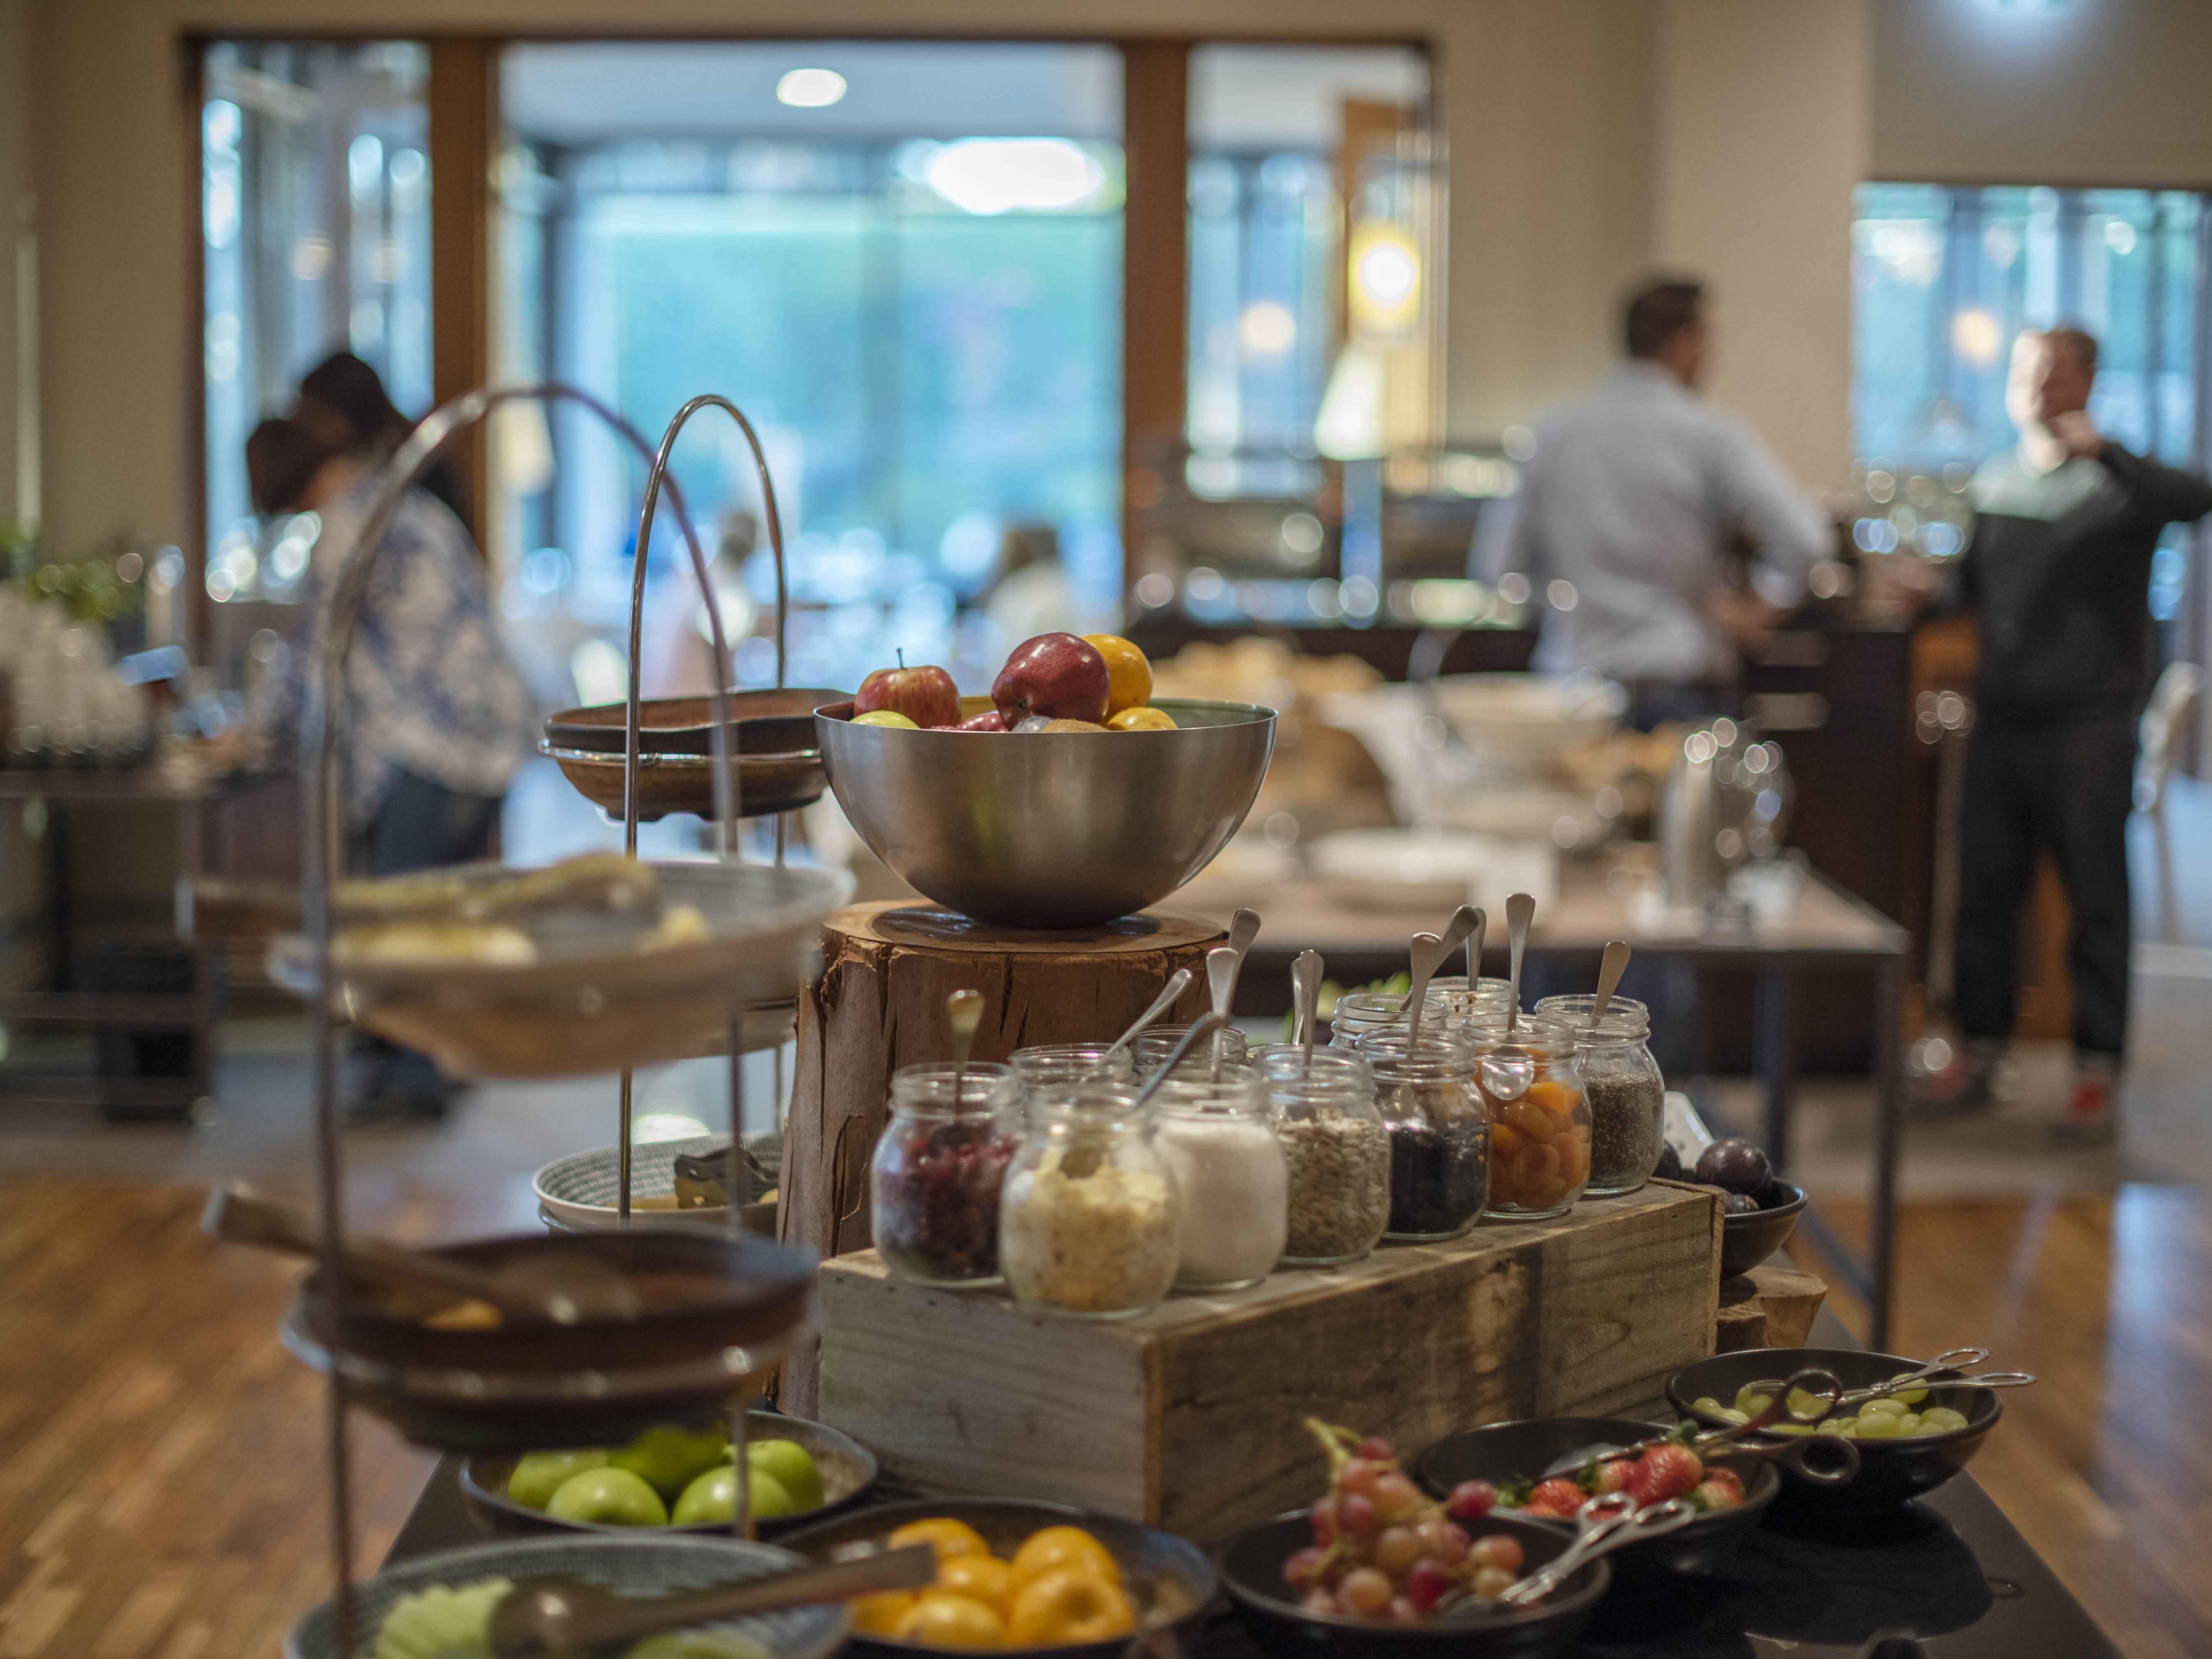 Bella Restaurant: Buffet breakfast spread